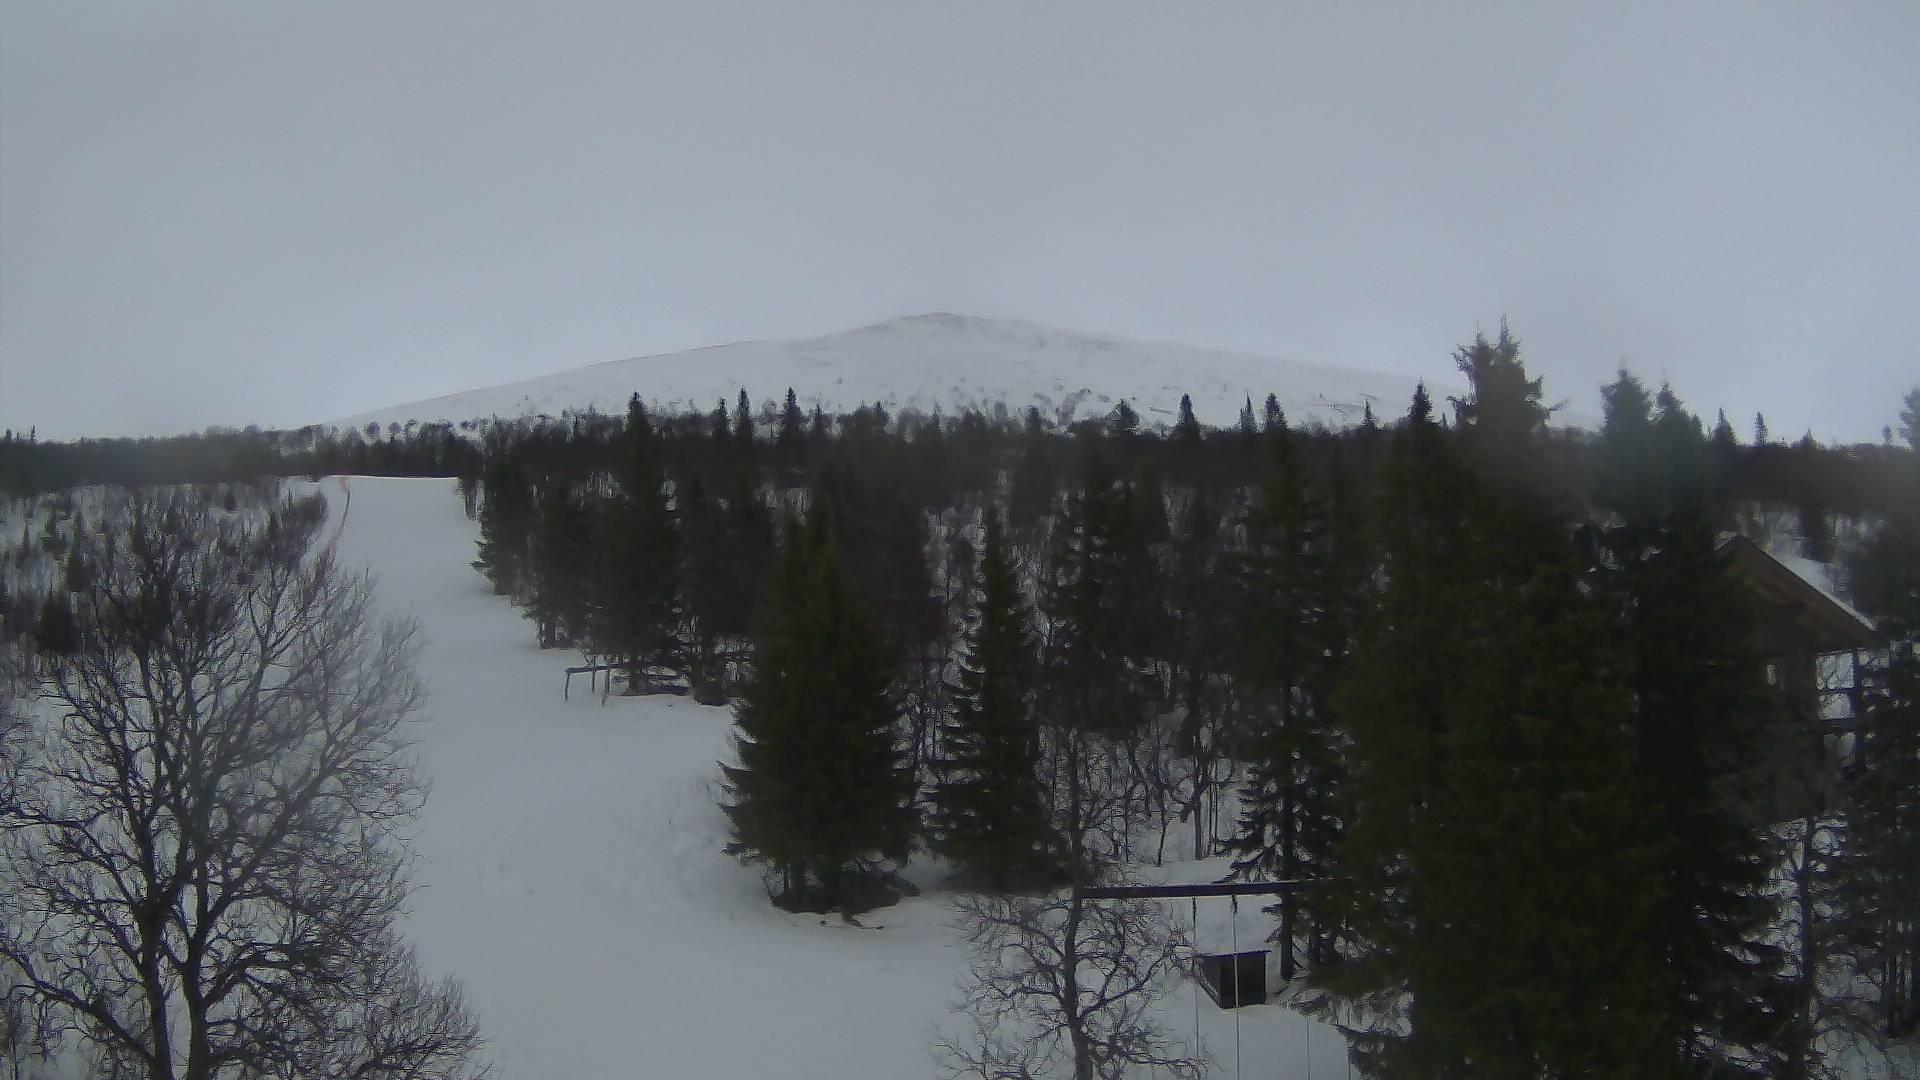 Webcam Bustadmon: Buustamons Fjällgård